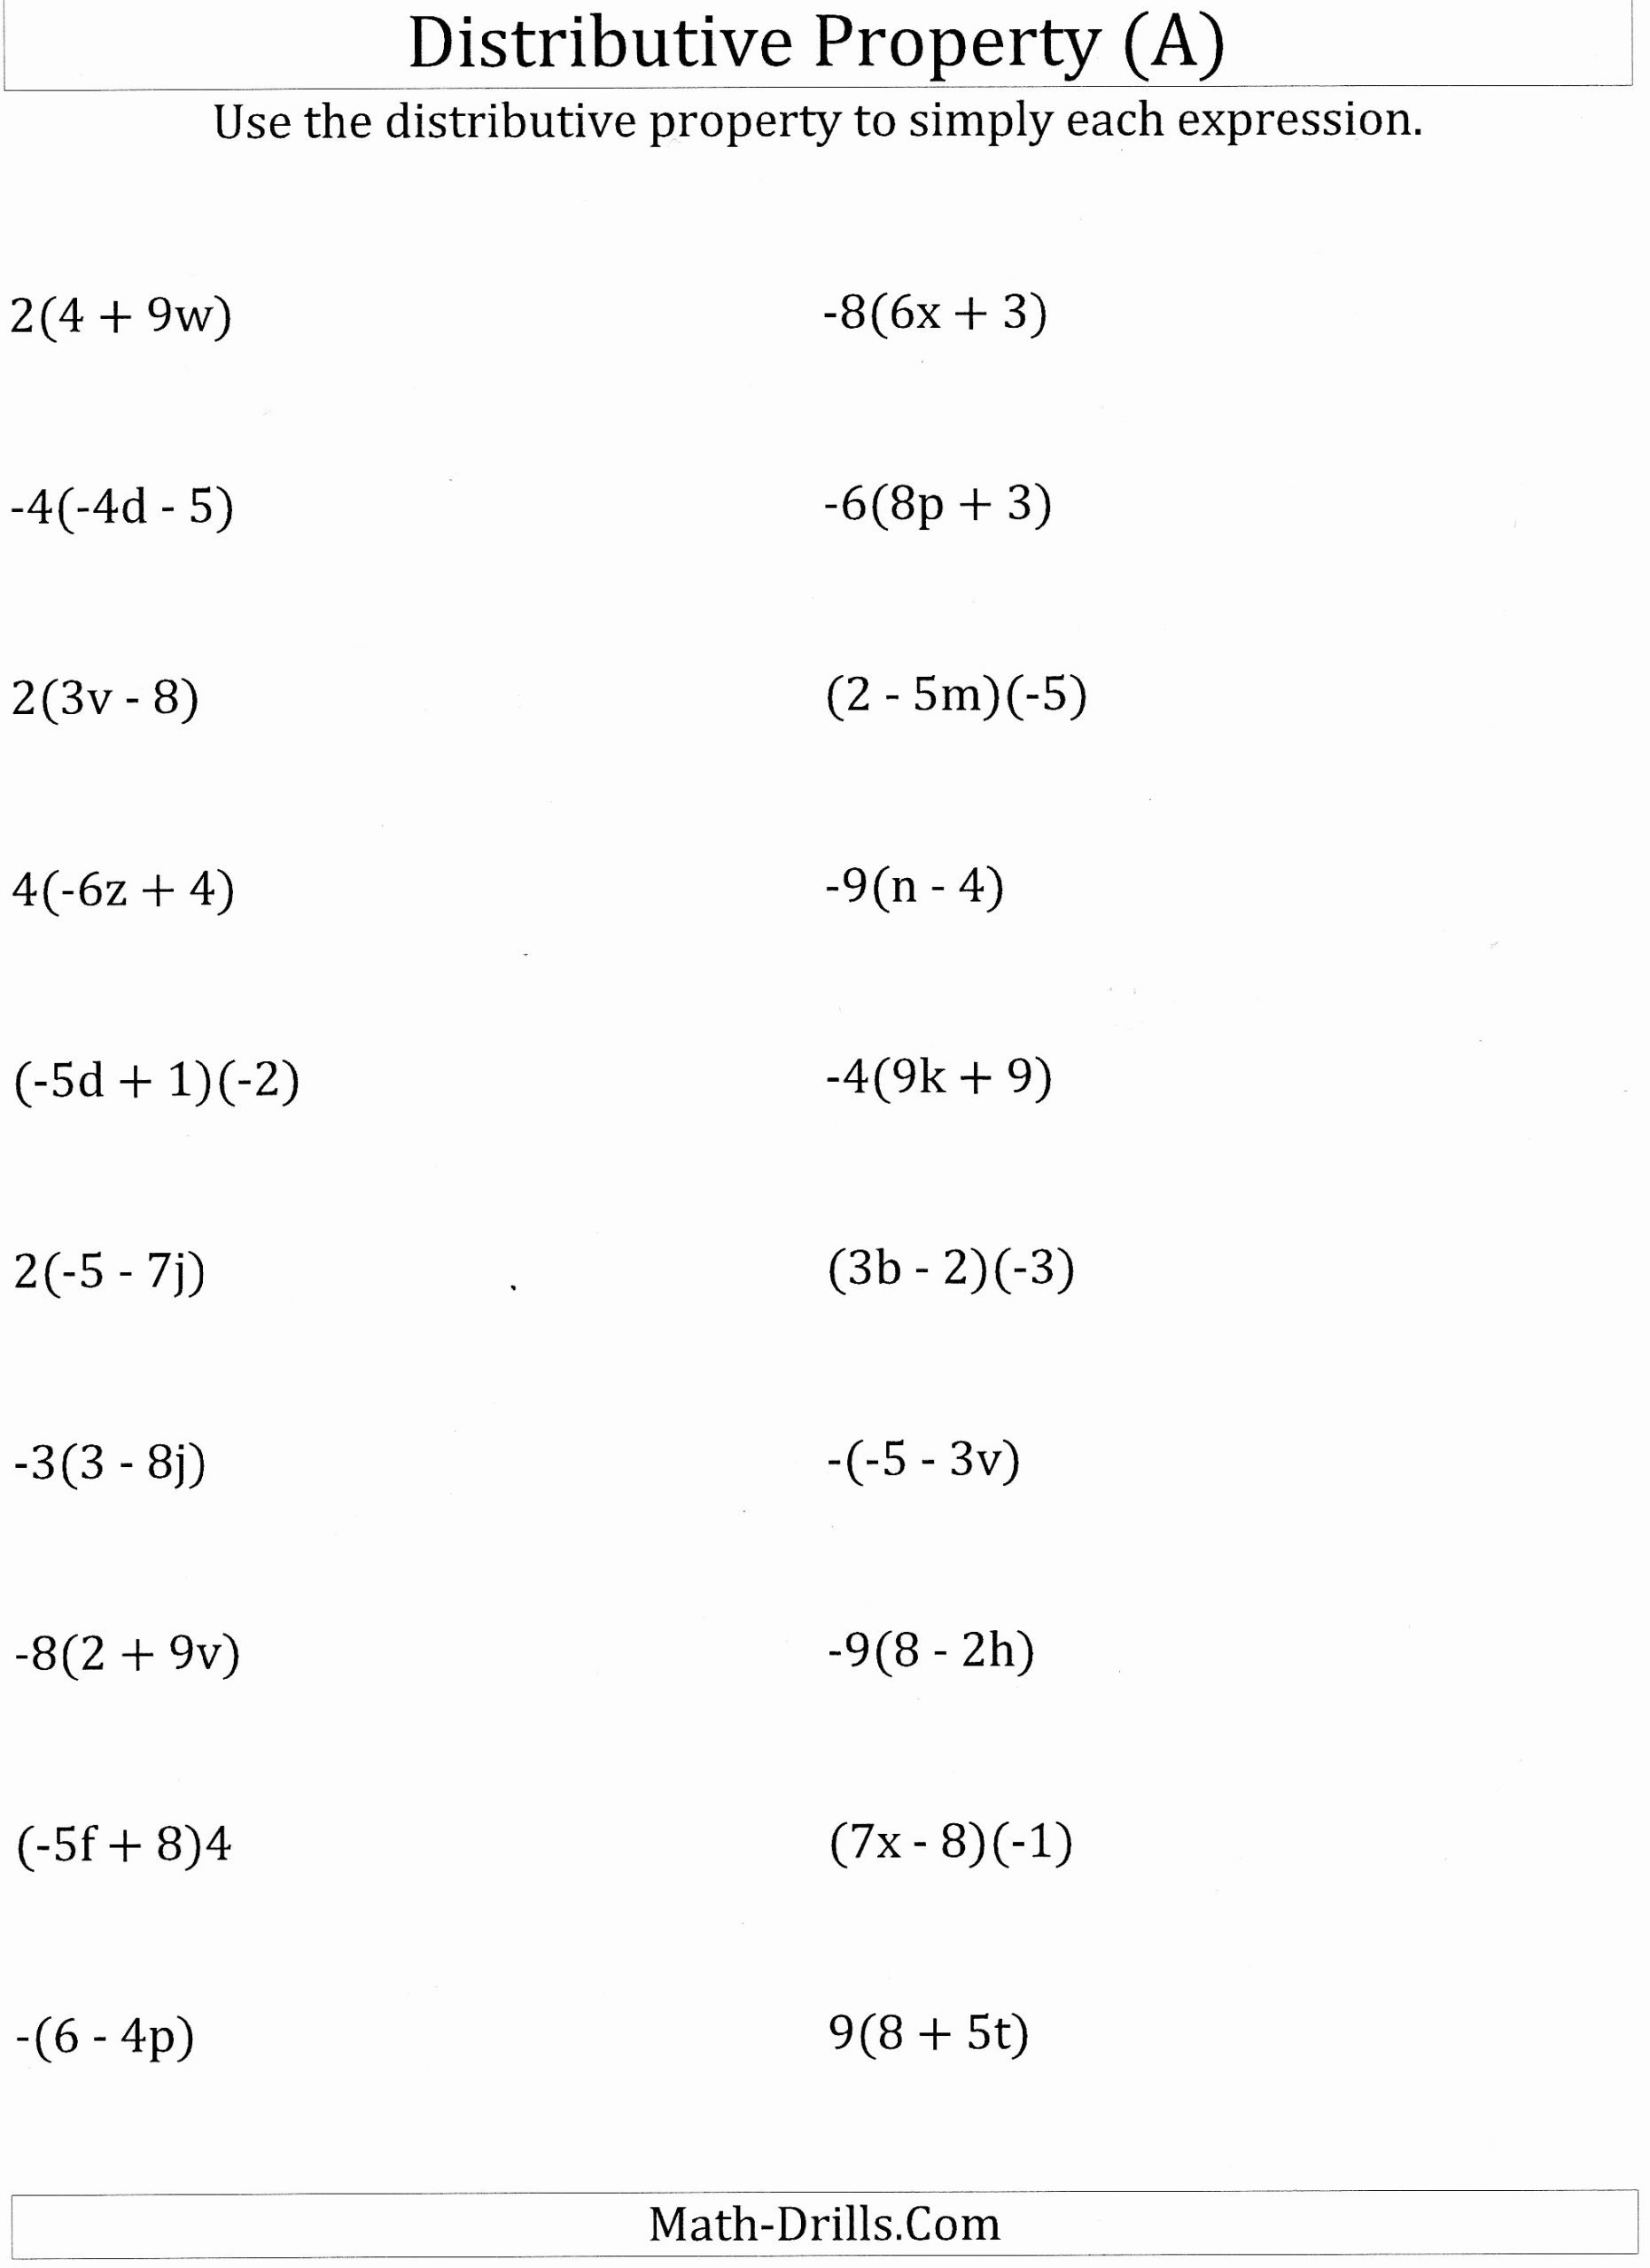 Distributive Property Worksheets 7th Grade Lovely Worksheet Math Worksheets Distributive Property